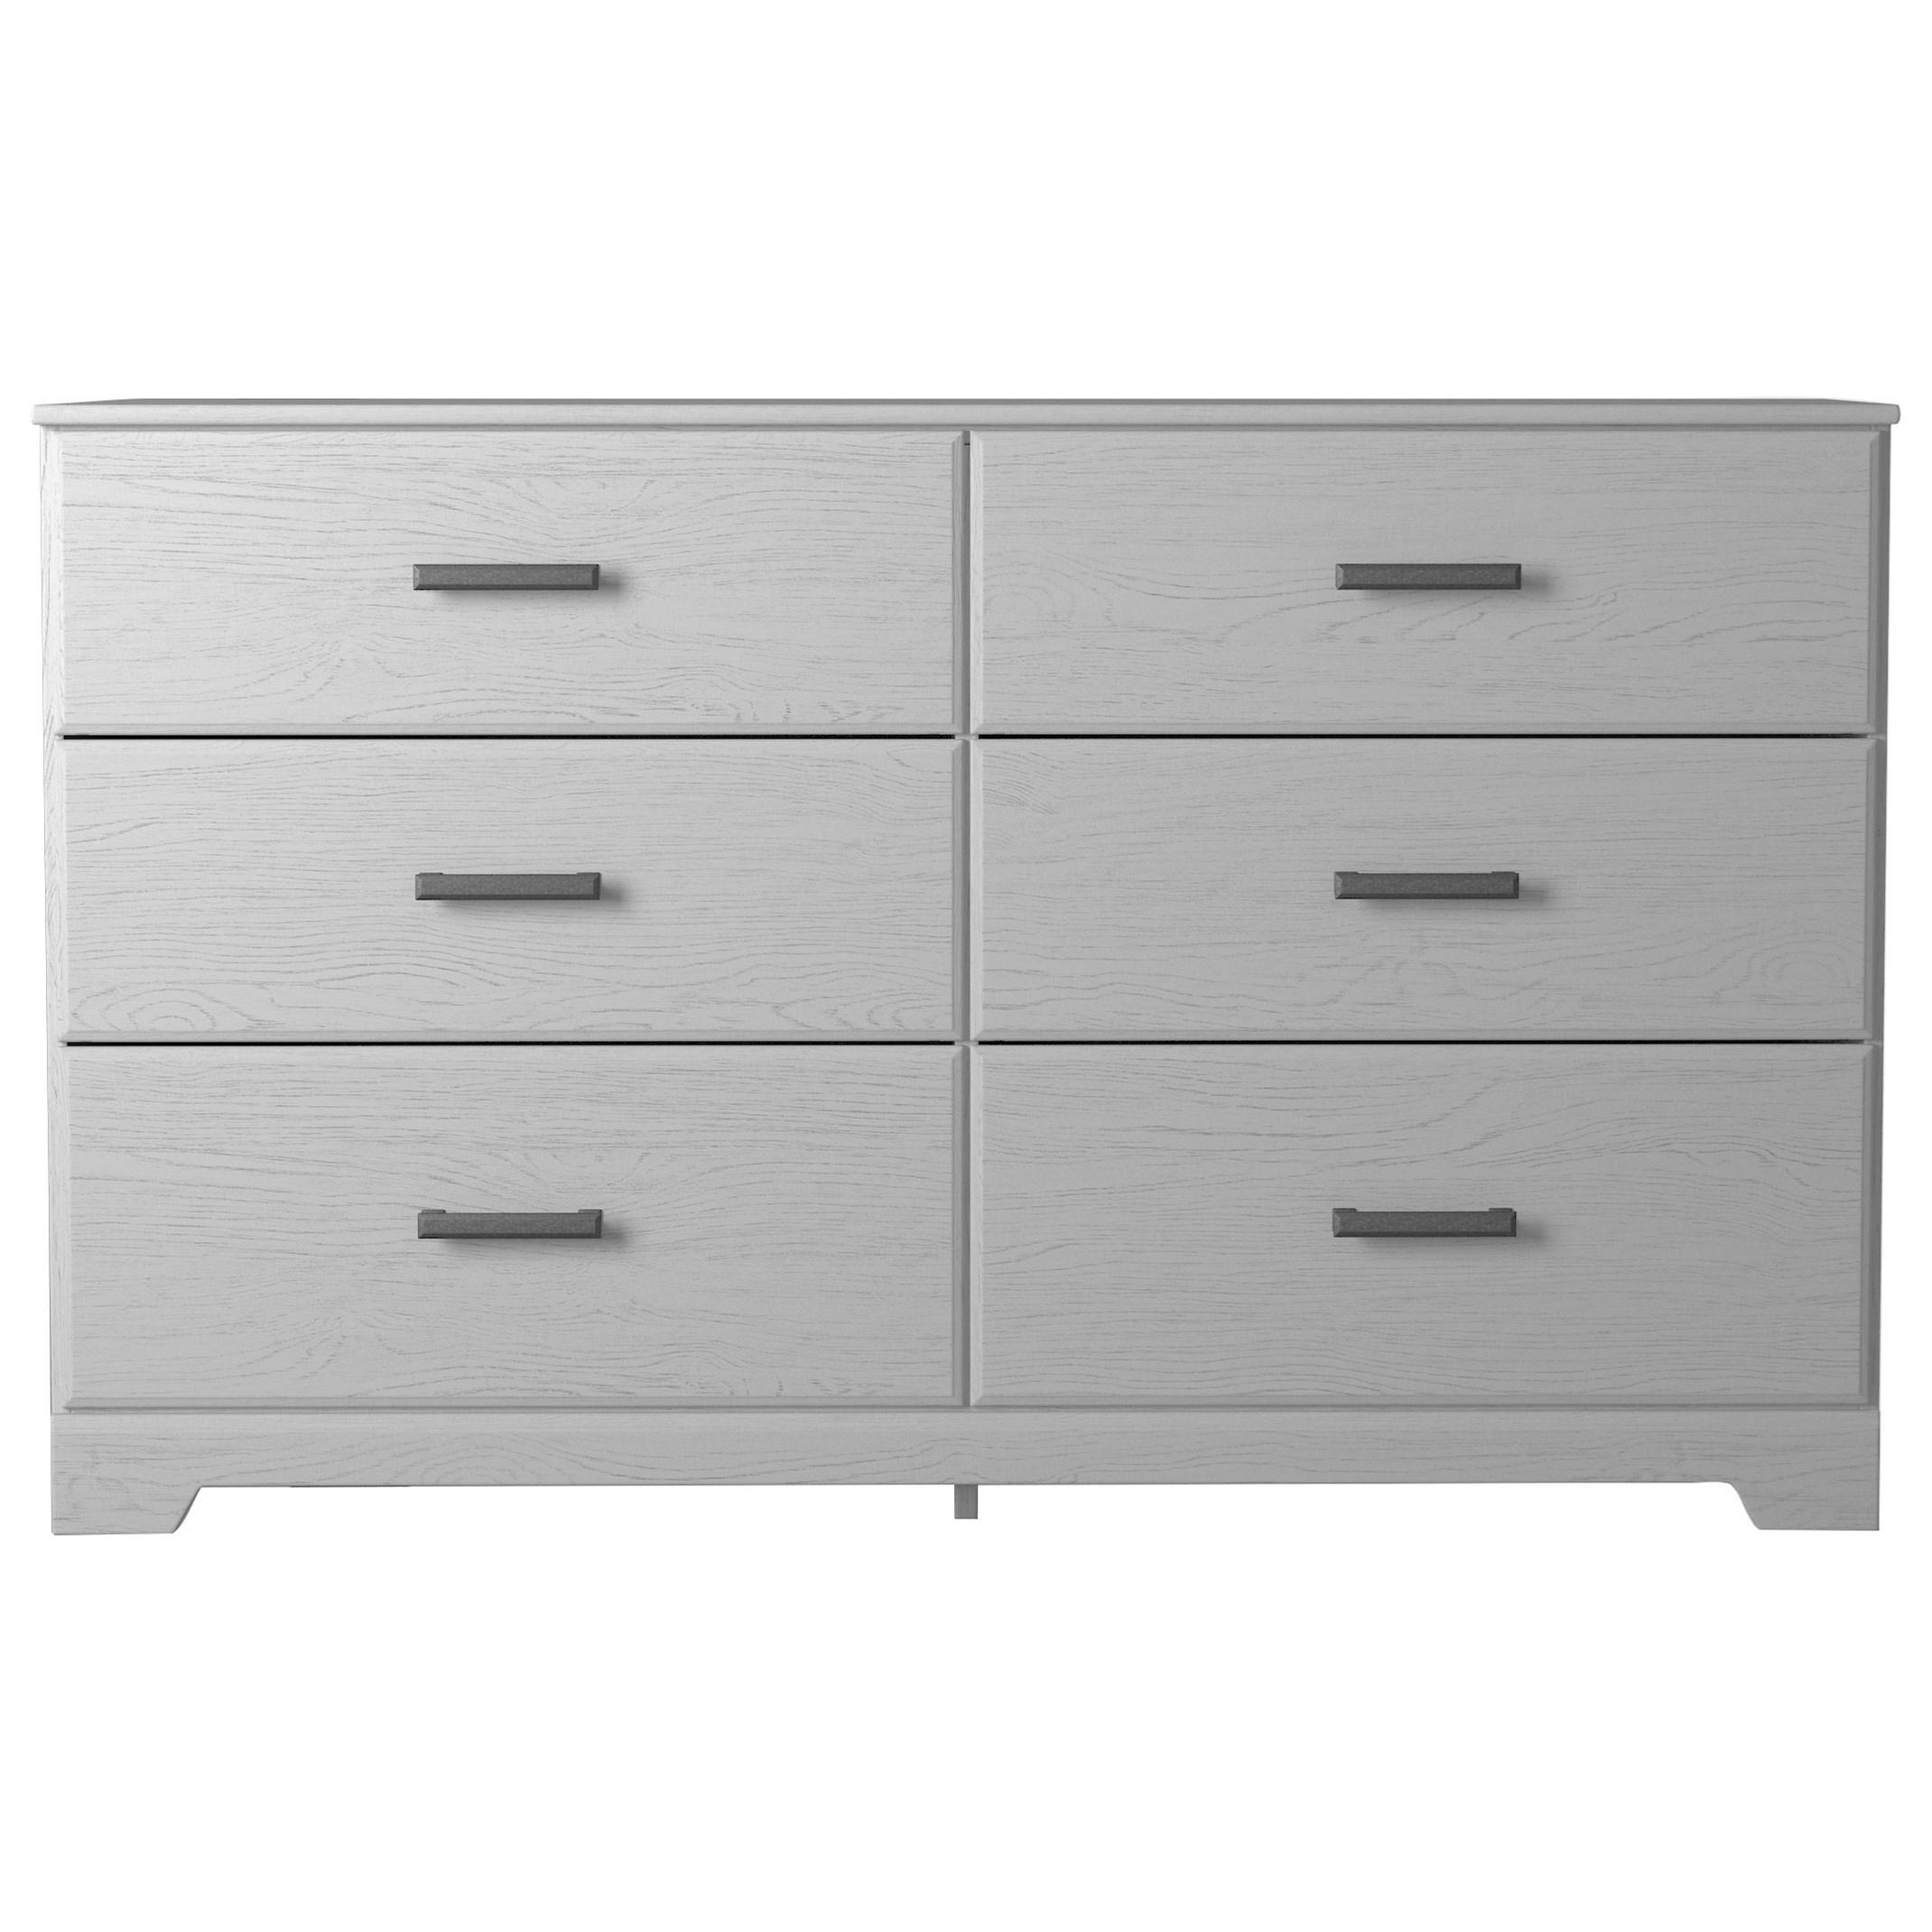 Stelsie Dresser by Signature Design by Ashley at Sparks HomeStore